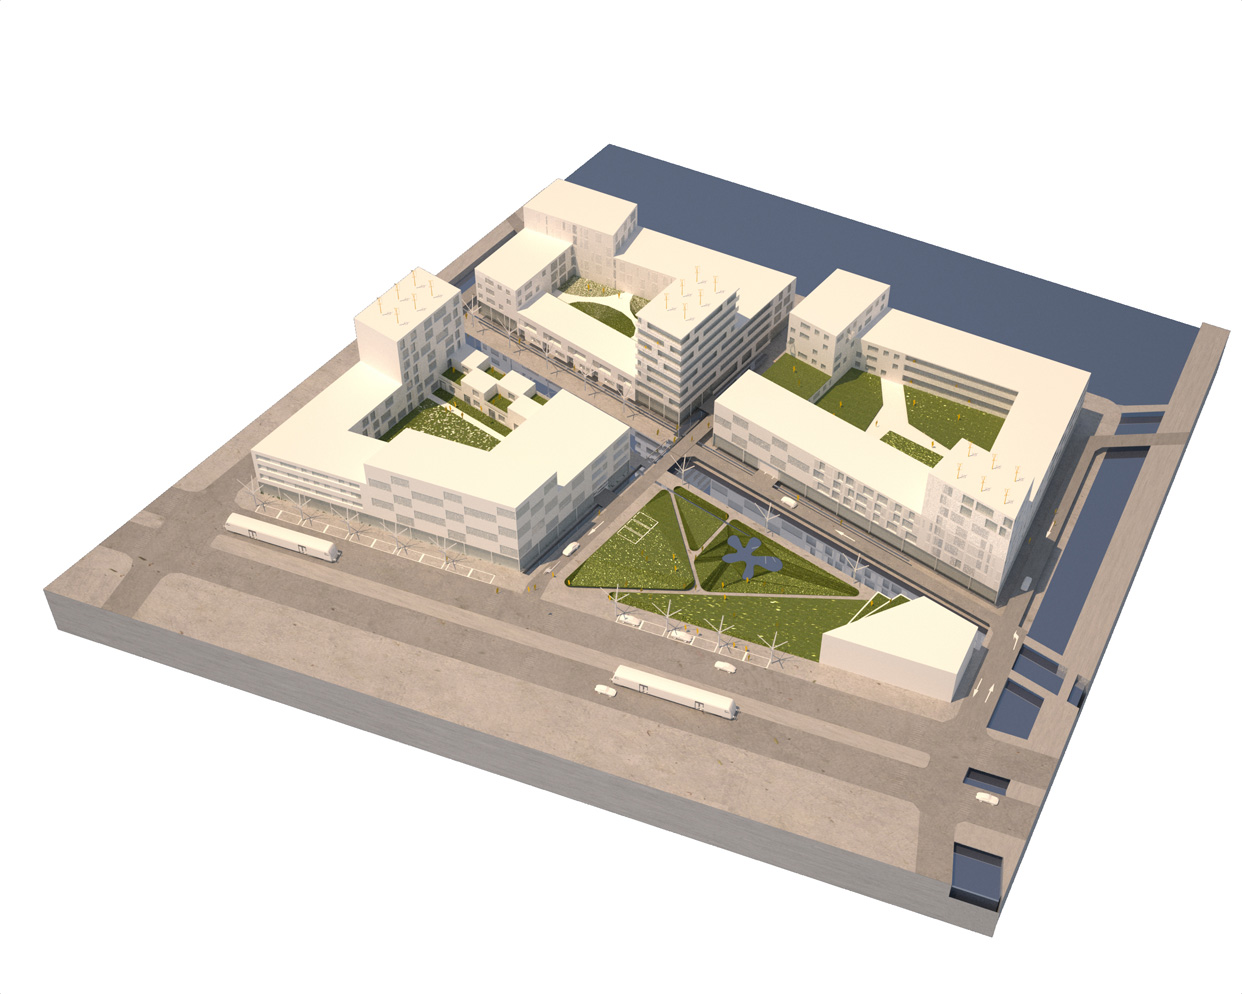 Jonkoping_Munksjon_Skeppsbrokajen_Bostader_Stadsbyggnad_Stadsplanering_Tavling_Typkvarter6_Varg_Arkitekter